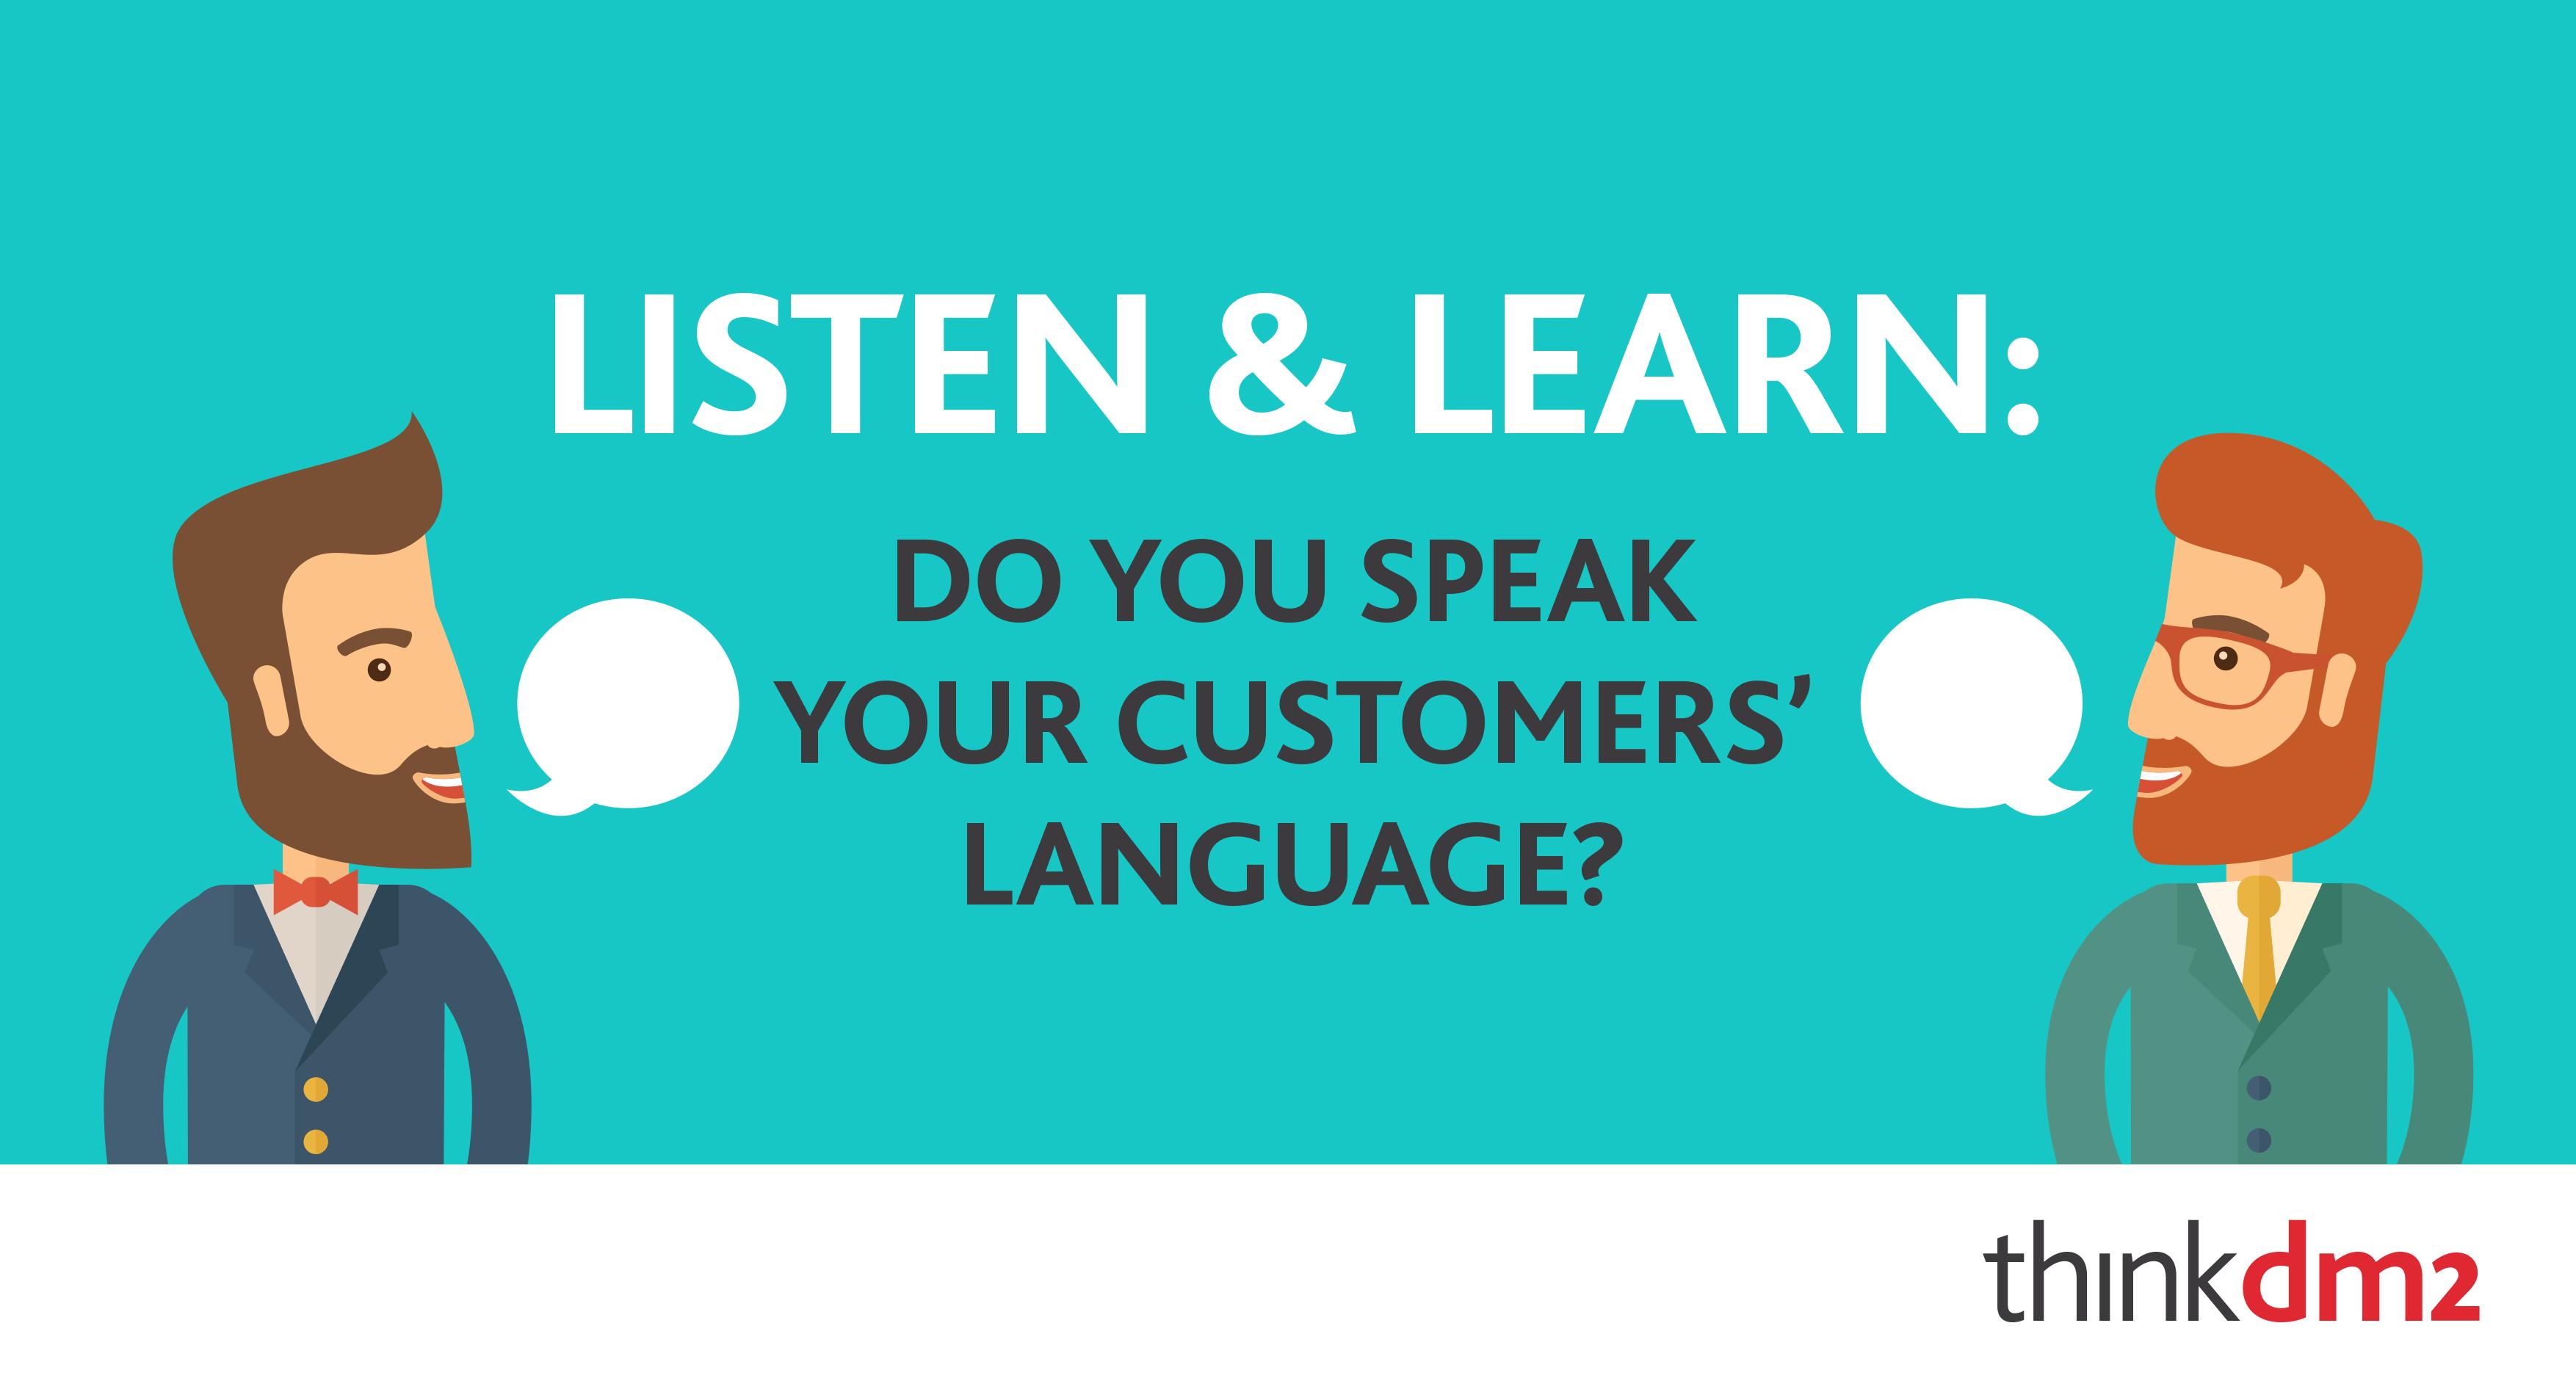 do you speak your customers' language